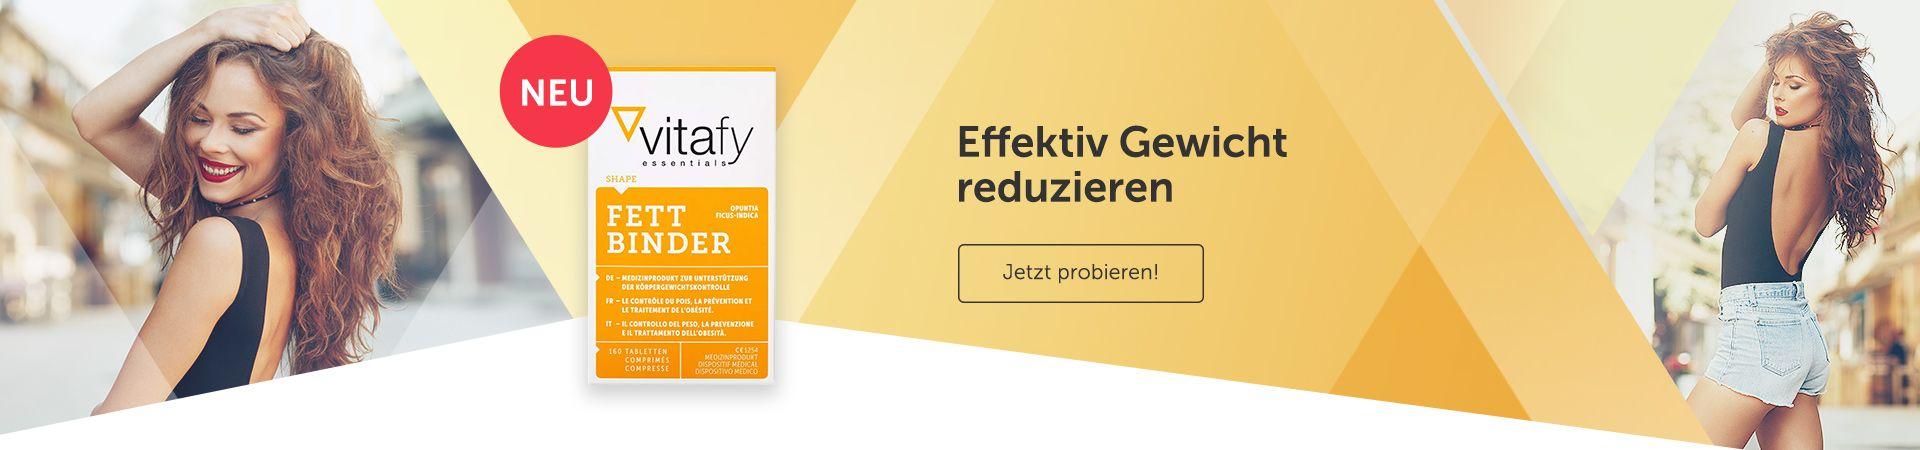 Vitafy Essentials Fettbinder